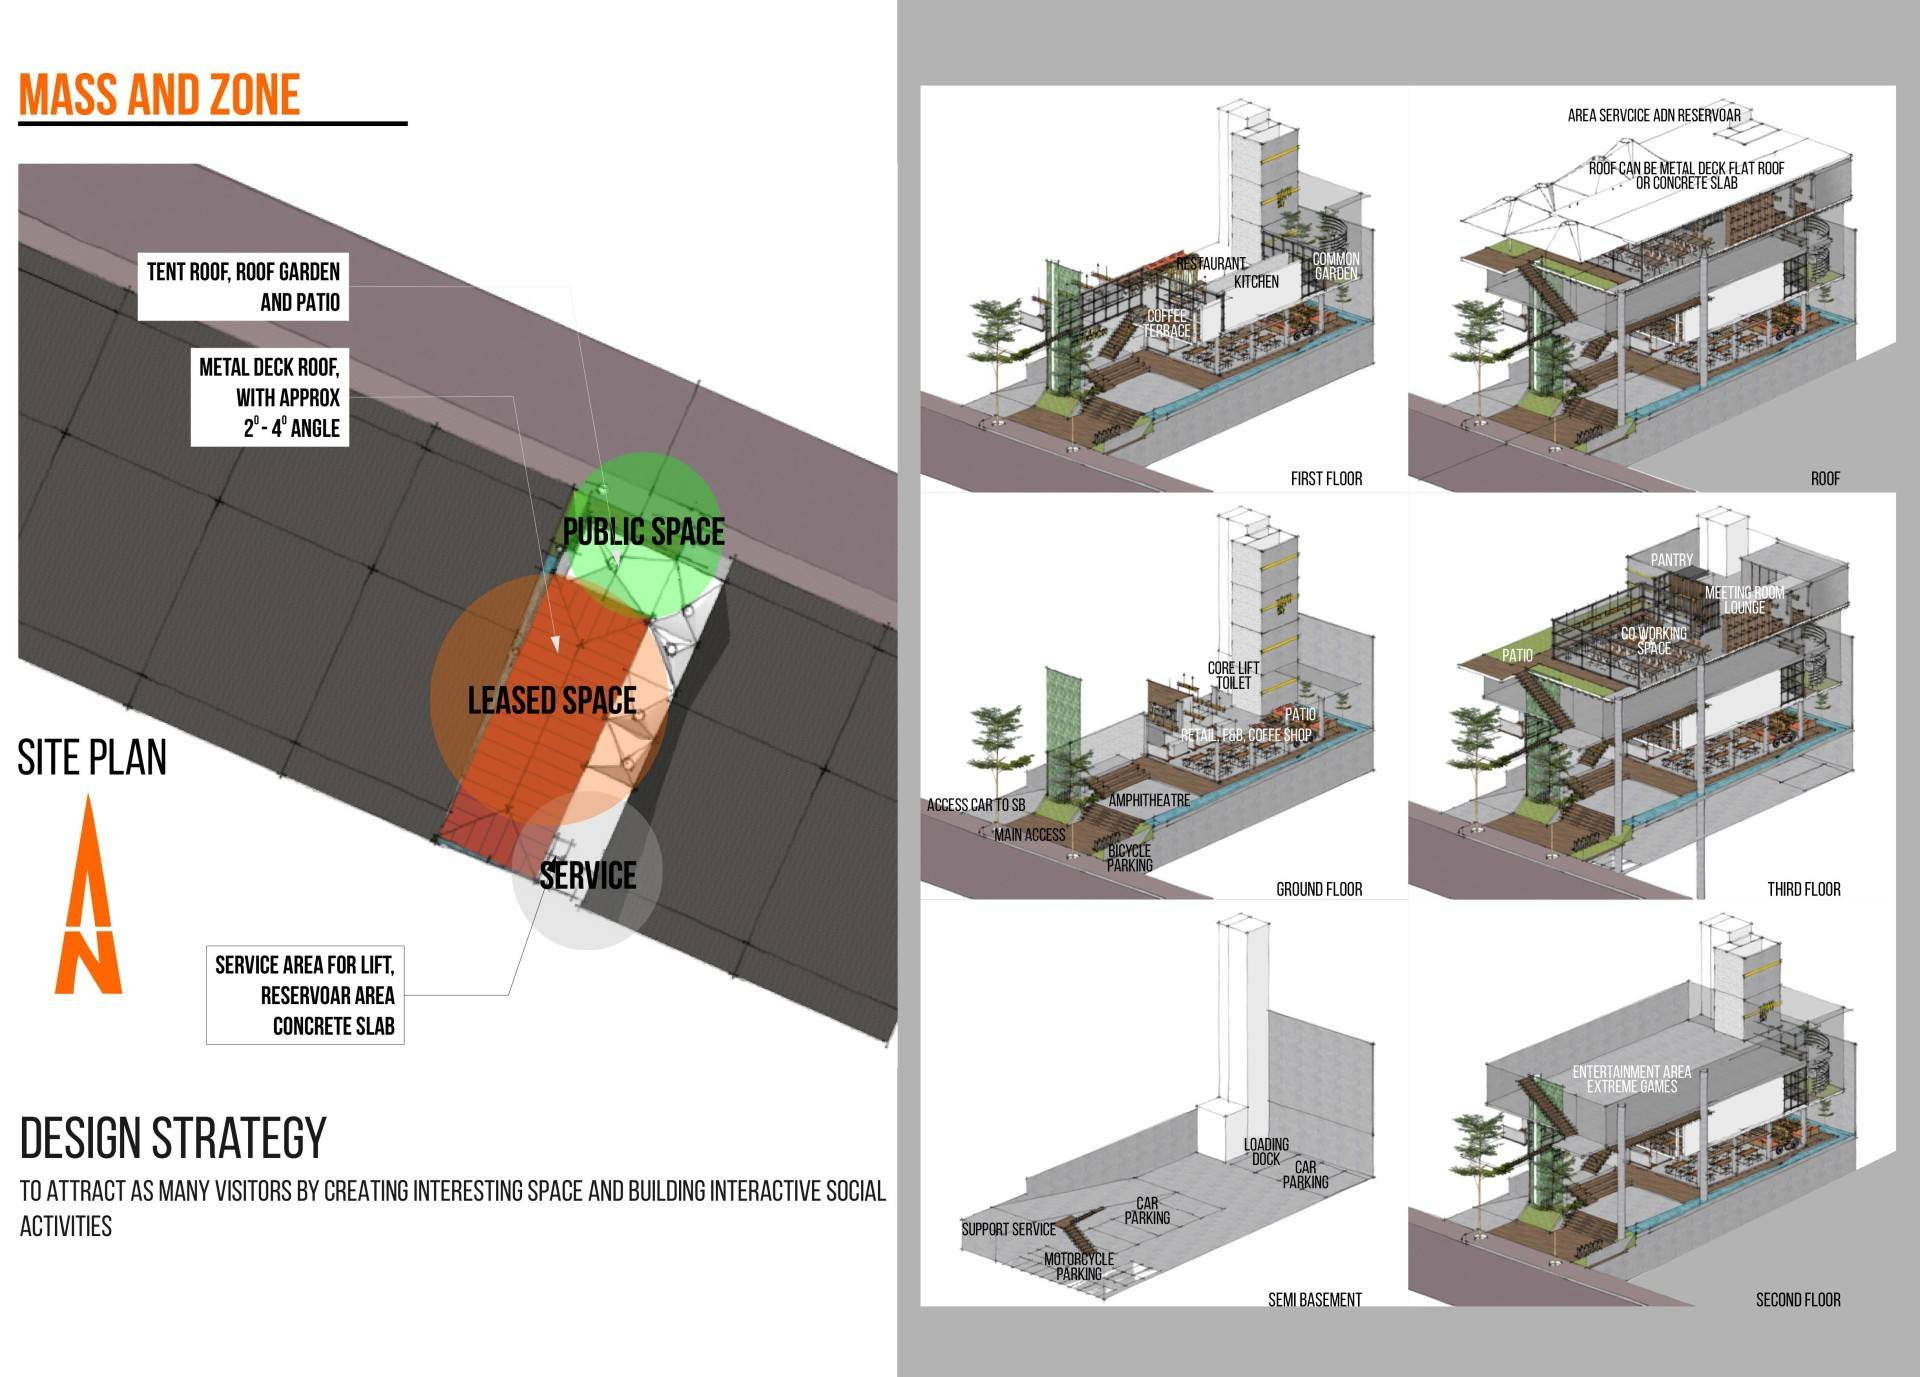 Dadan Adriansyah Lembong Land By Rupaidea Bandung, West Java, Indonesia Bandung, West Java, Indonesia Page-2   4673